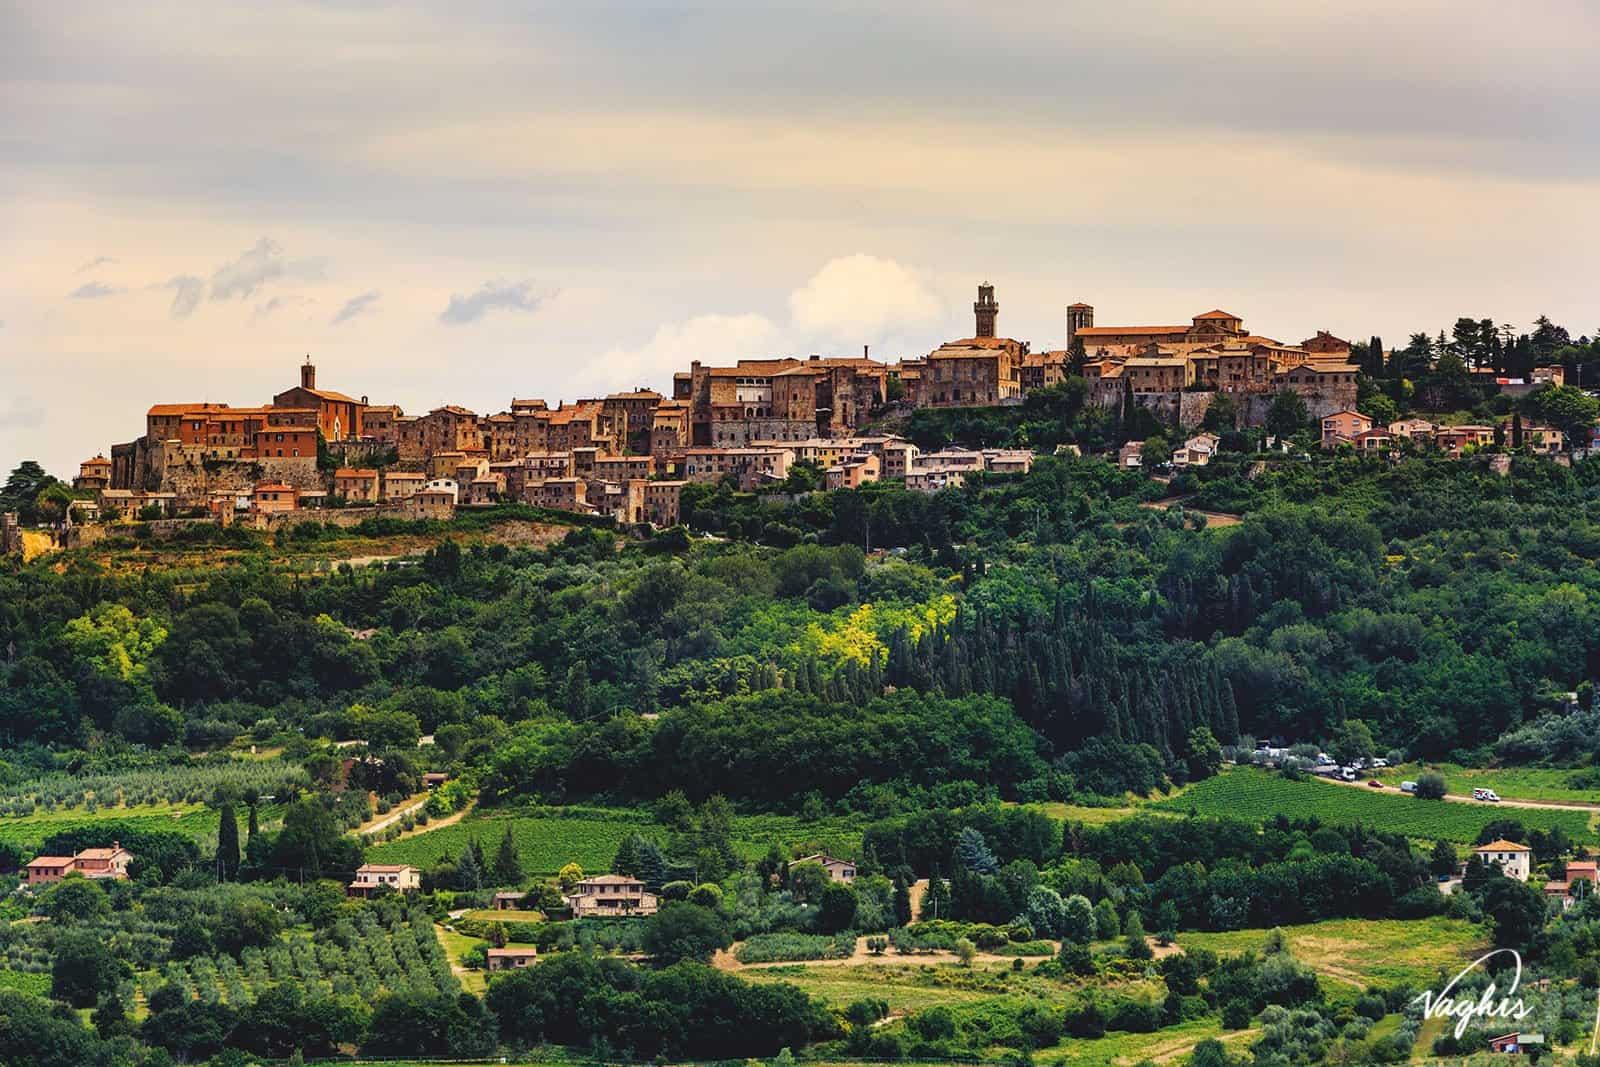 Montepulciano - © Vaghis - Viaggi & turismo Italia - Tutti i diritti riservati